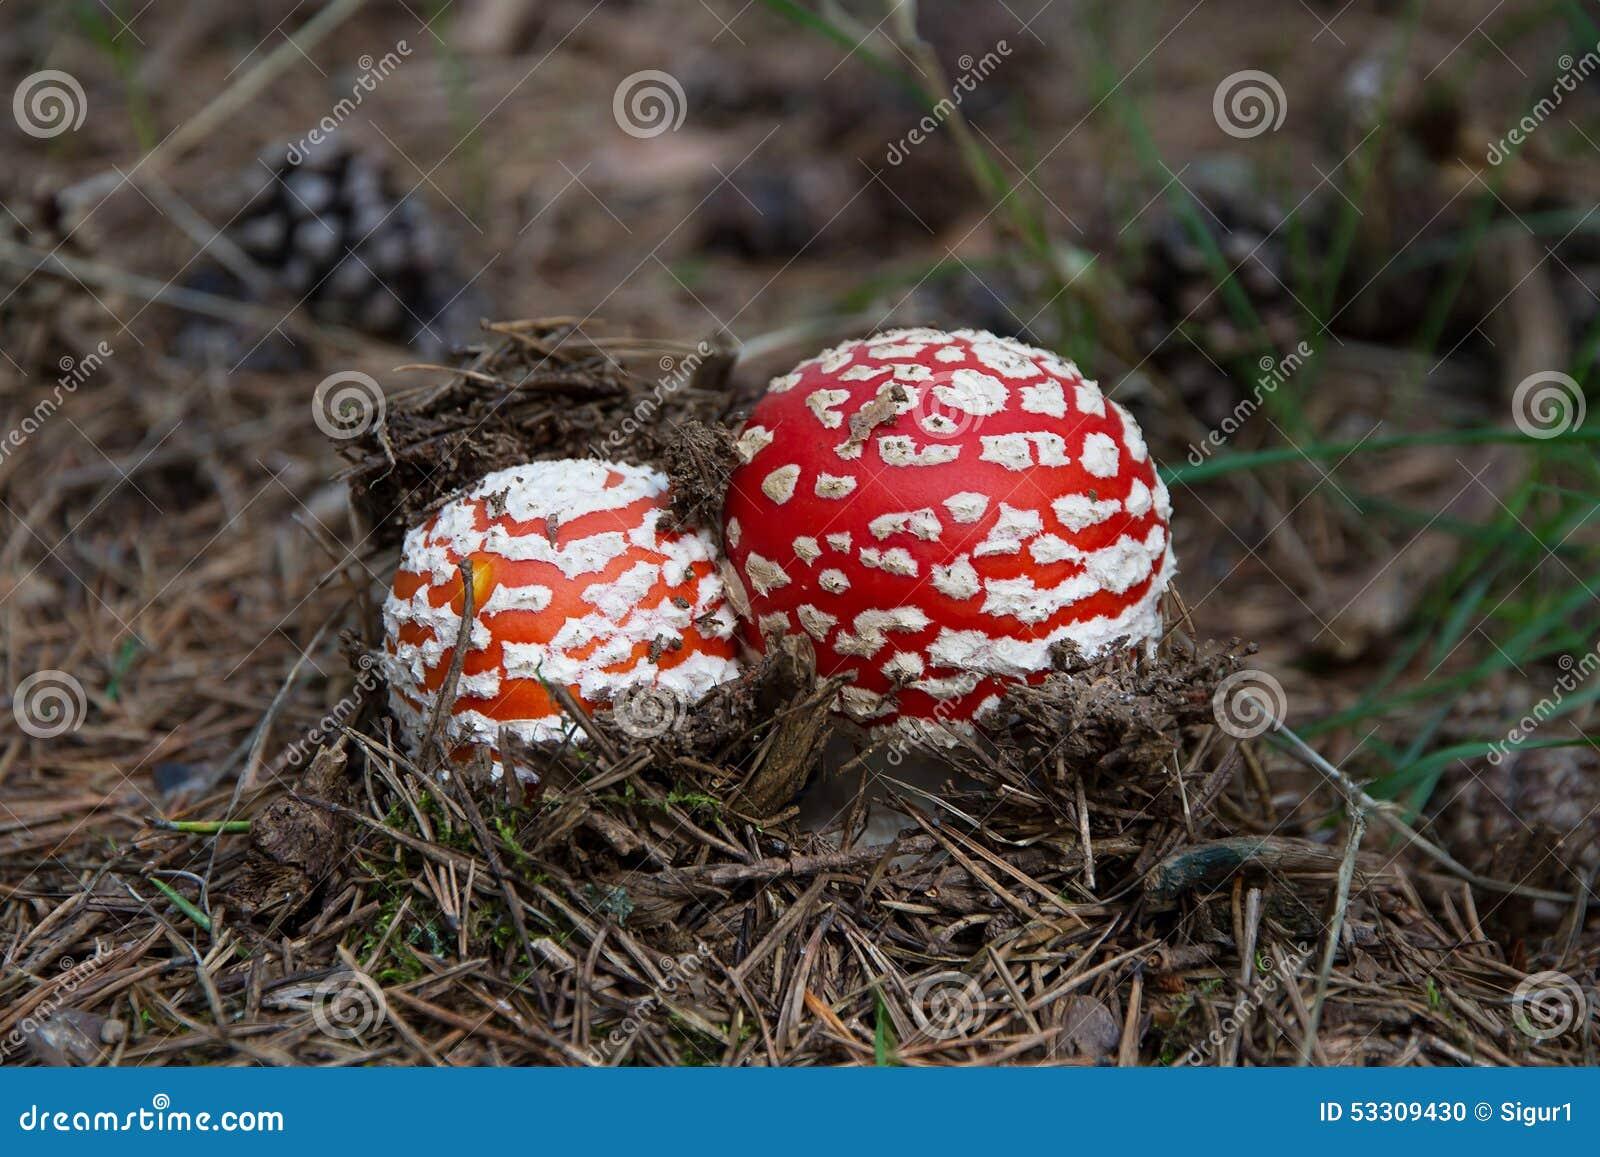 Mushroom fly amanit in pinewood